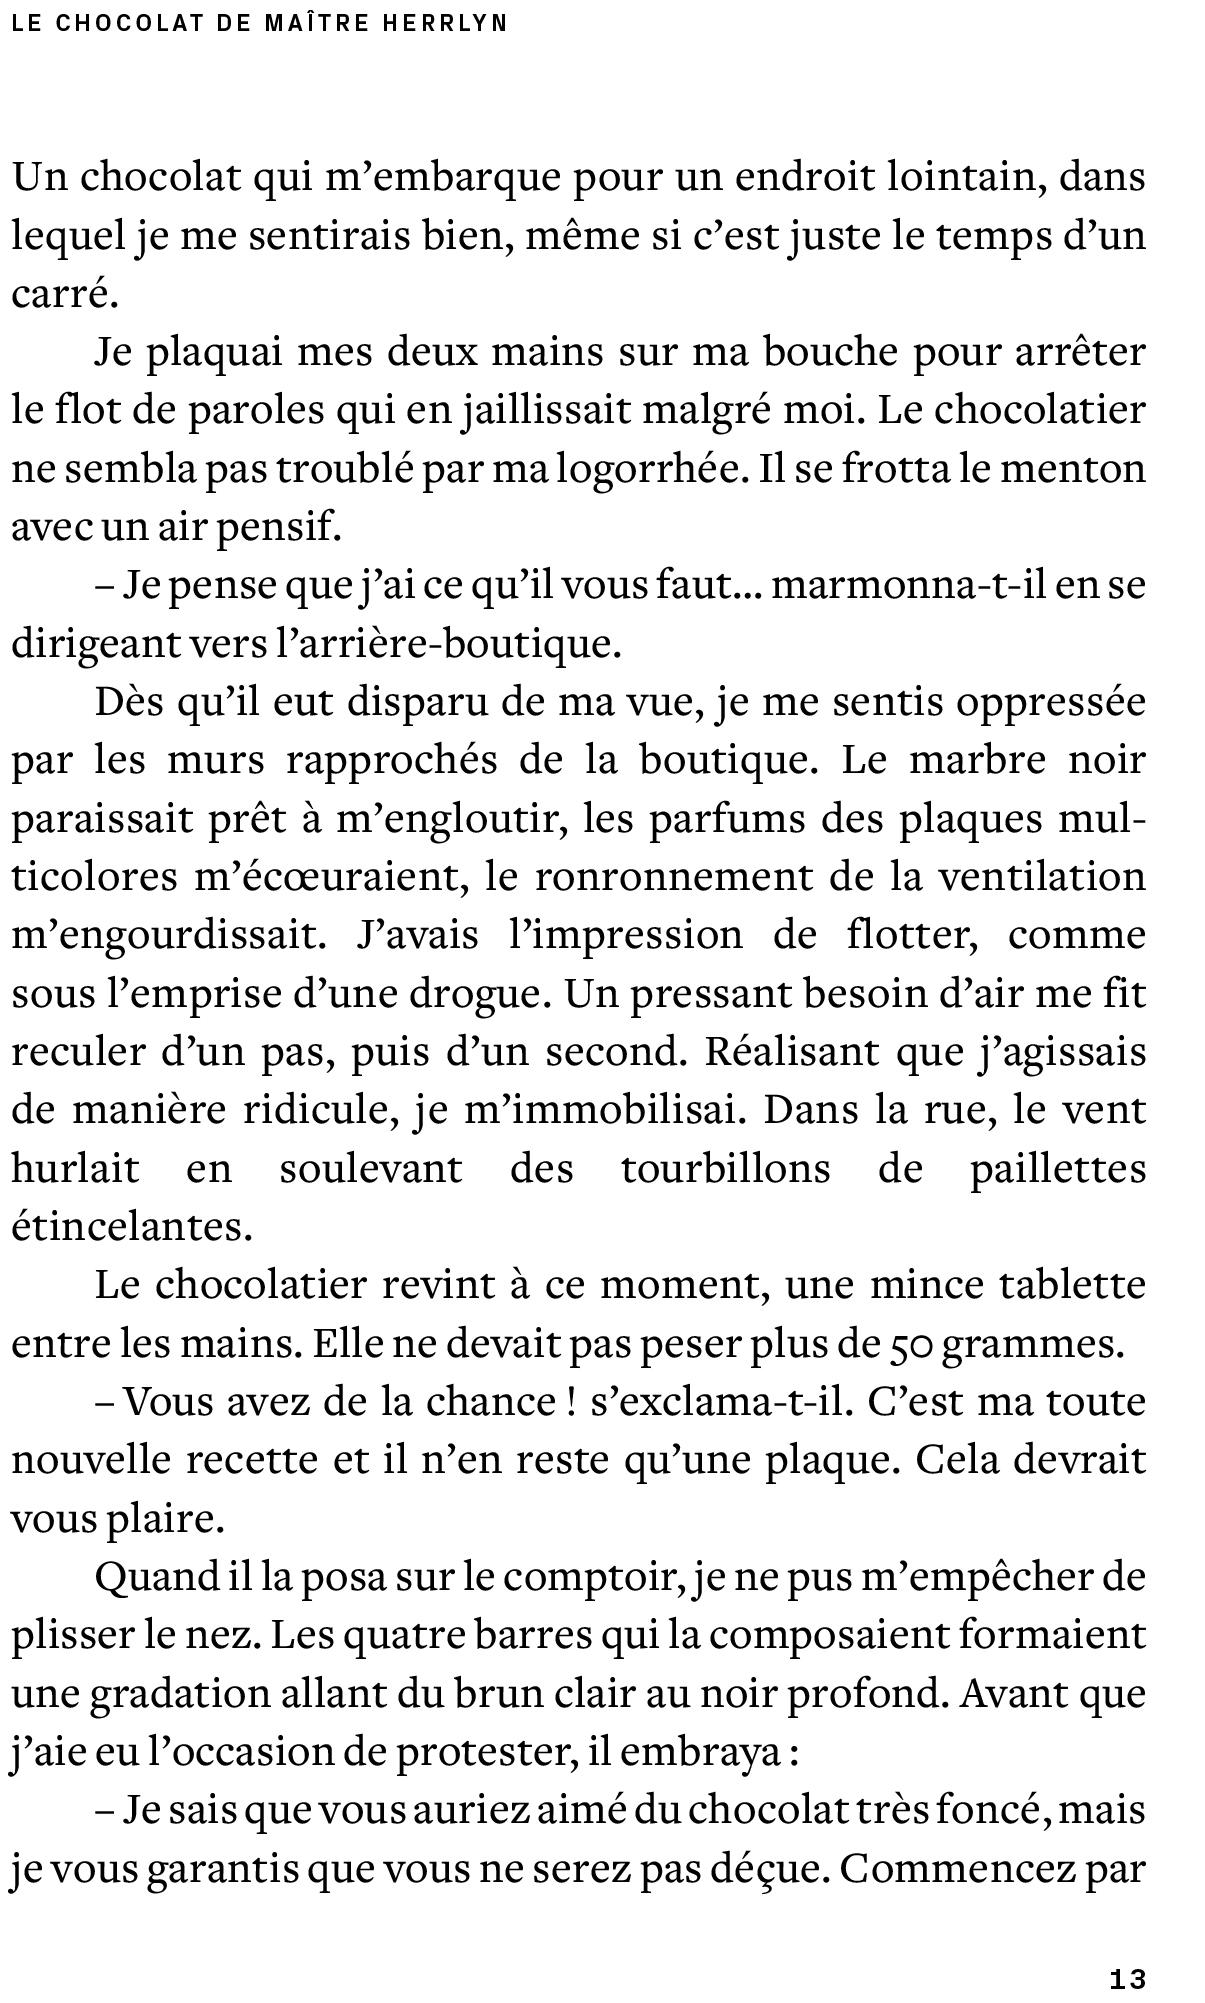 Eclats de chocolat - page 13